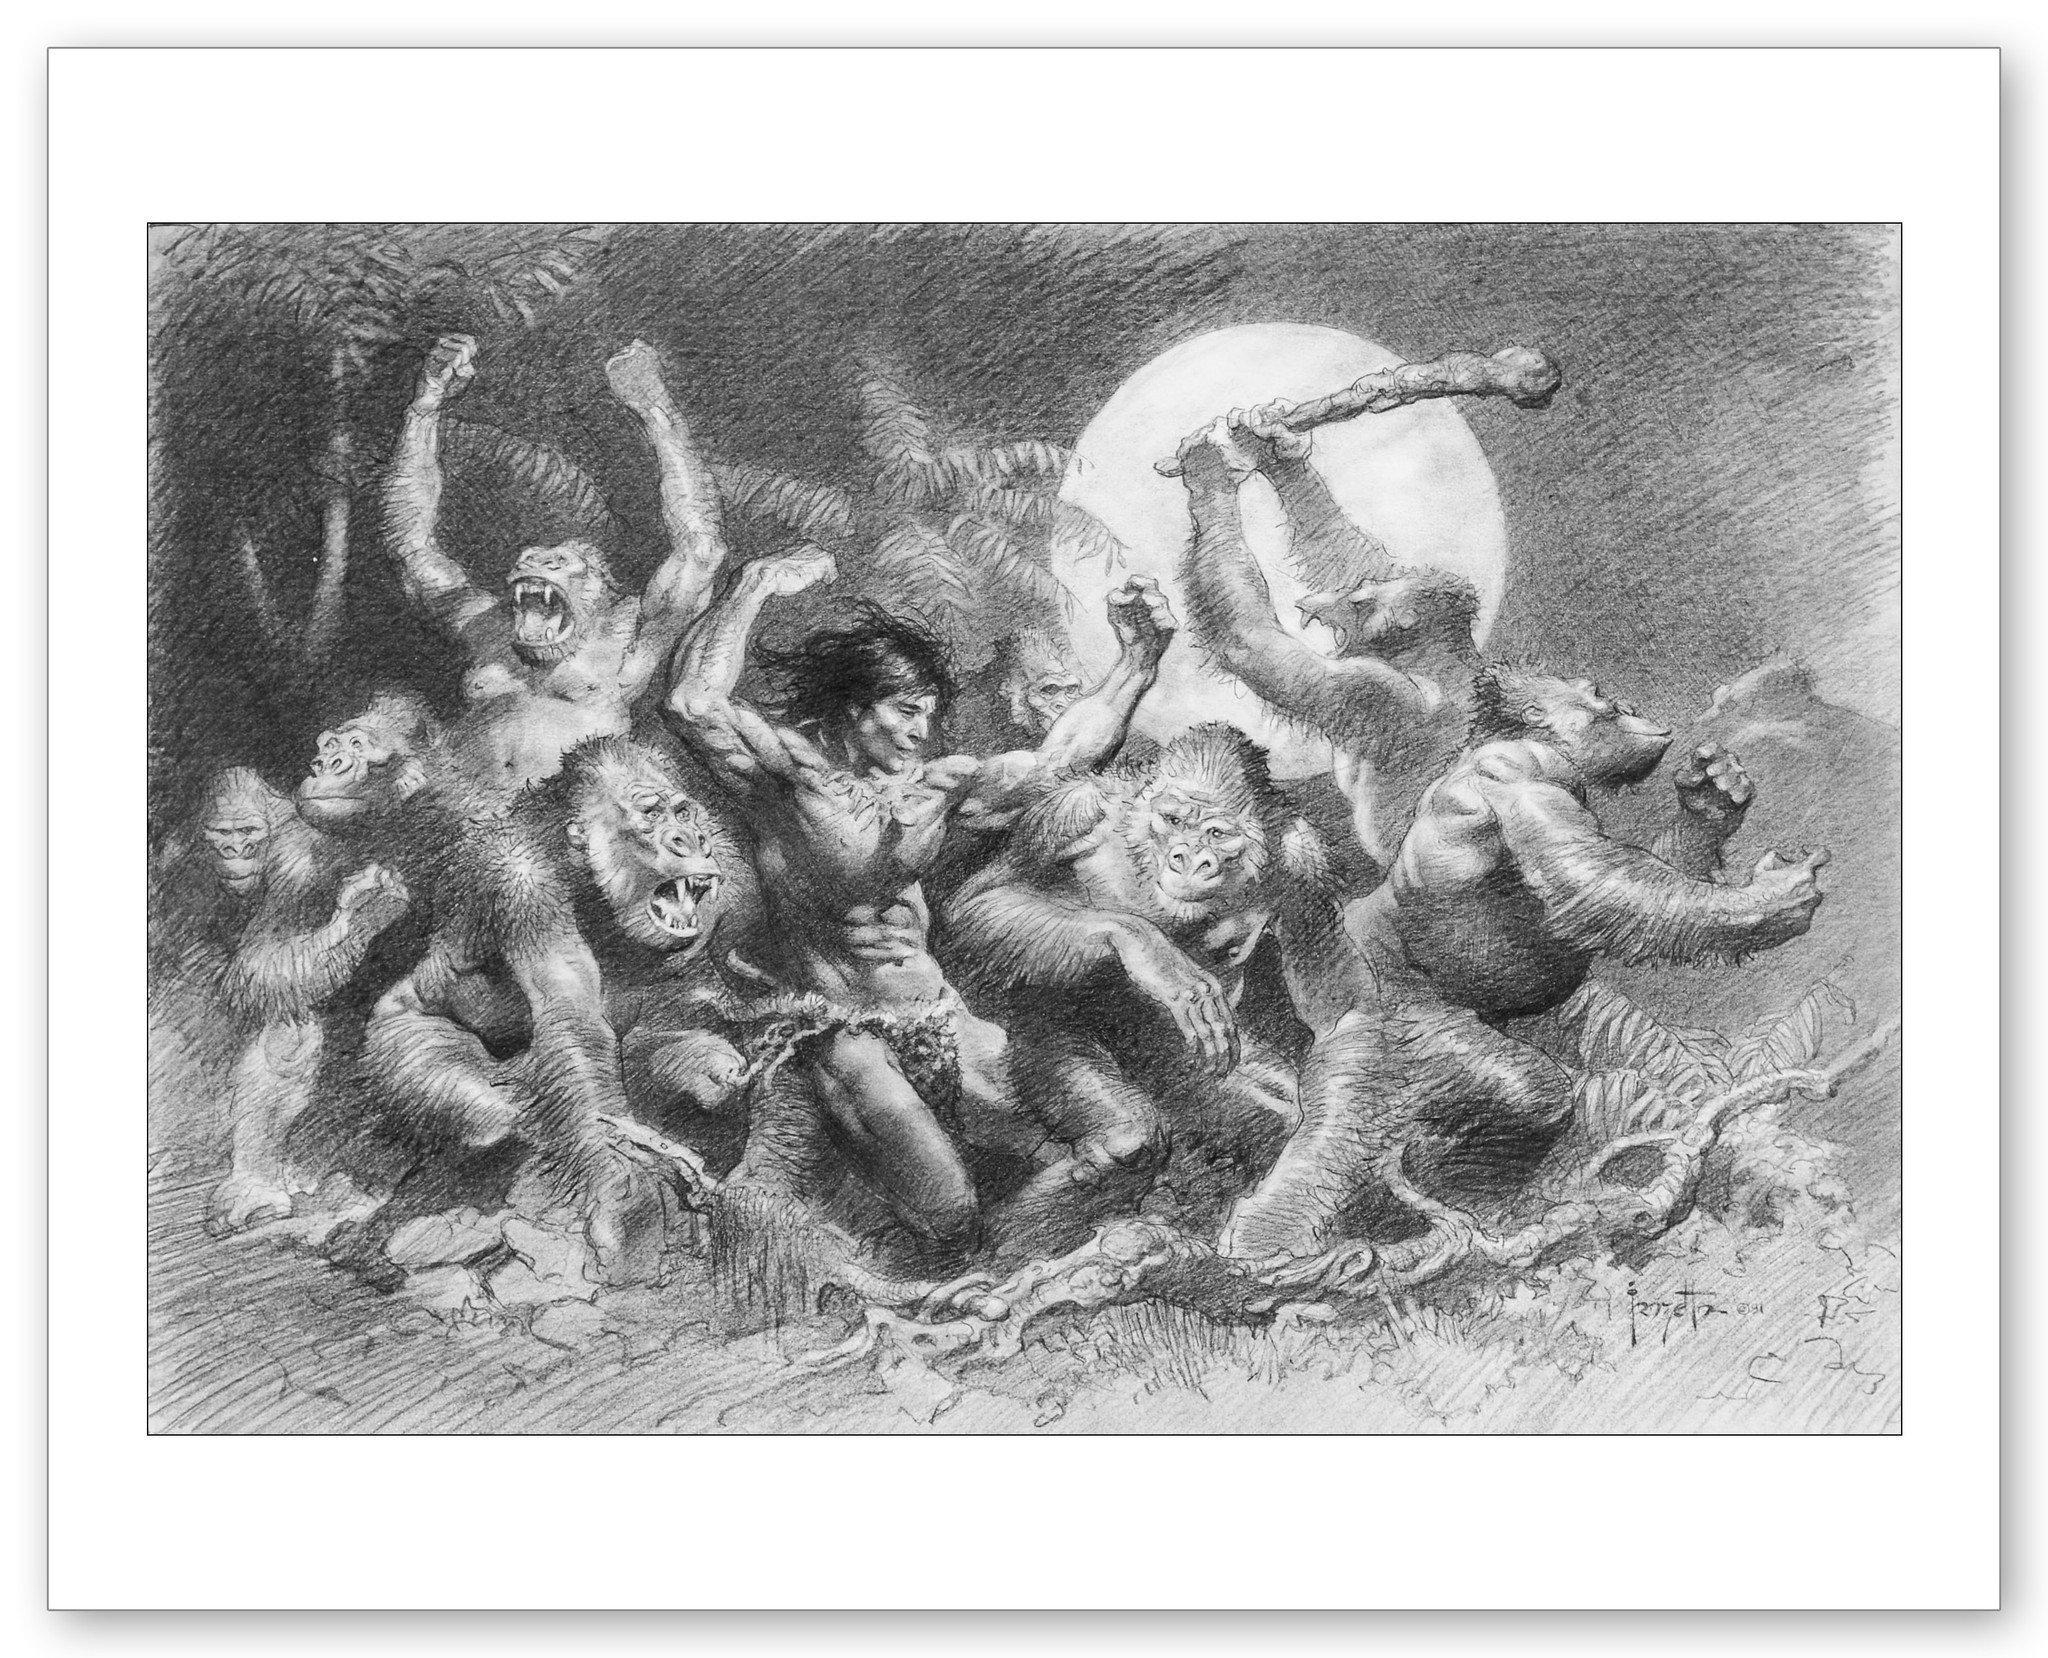 frazettagirls-tarzan-at-the-dum-dum-print-20661947654